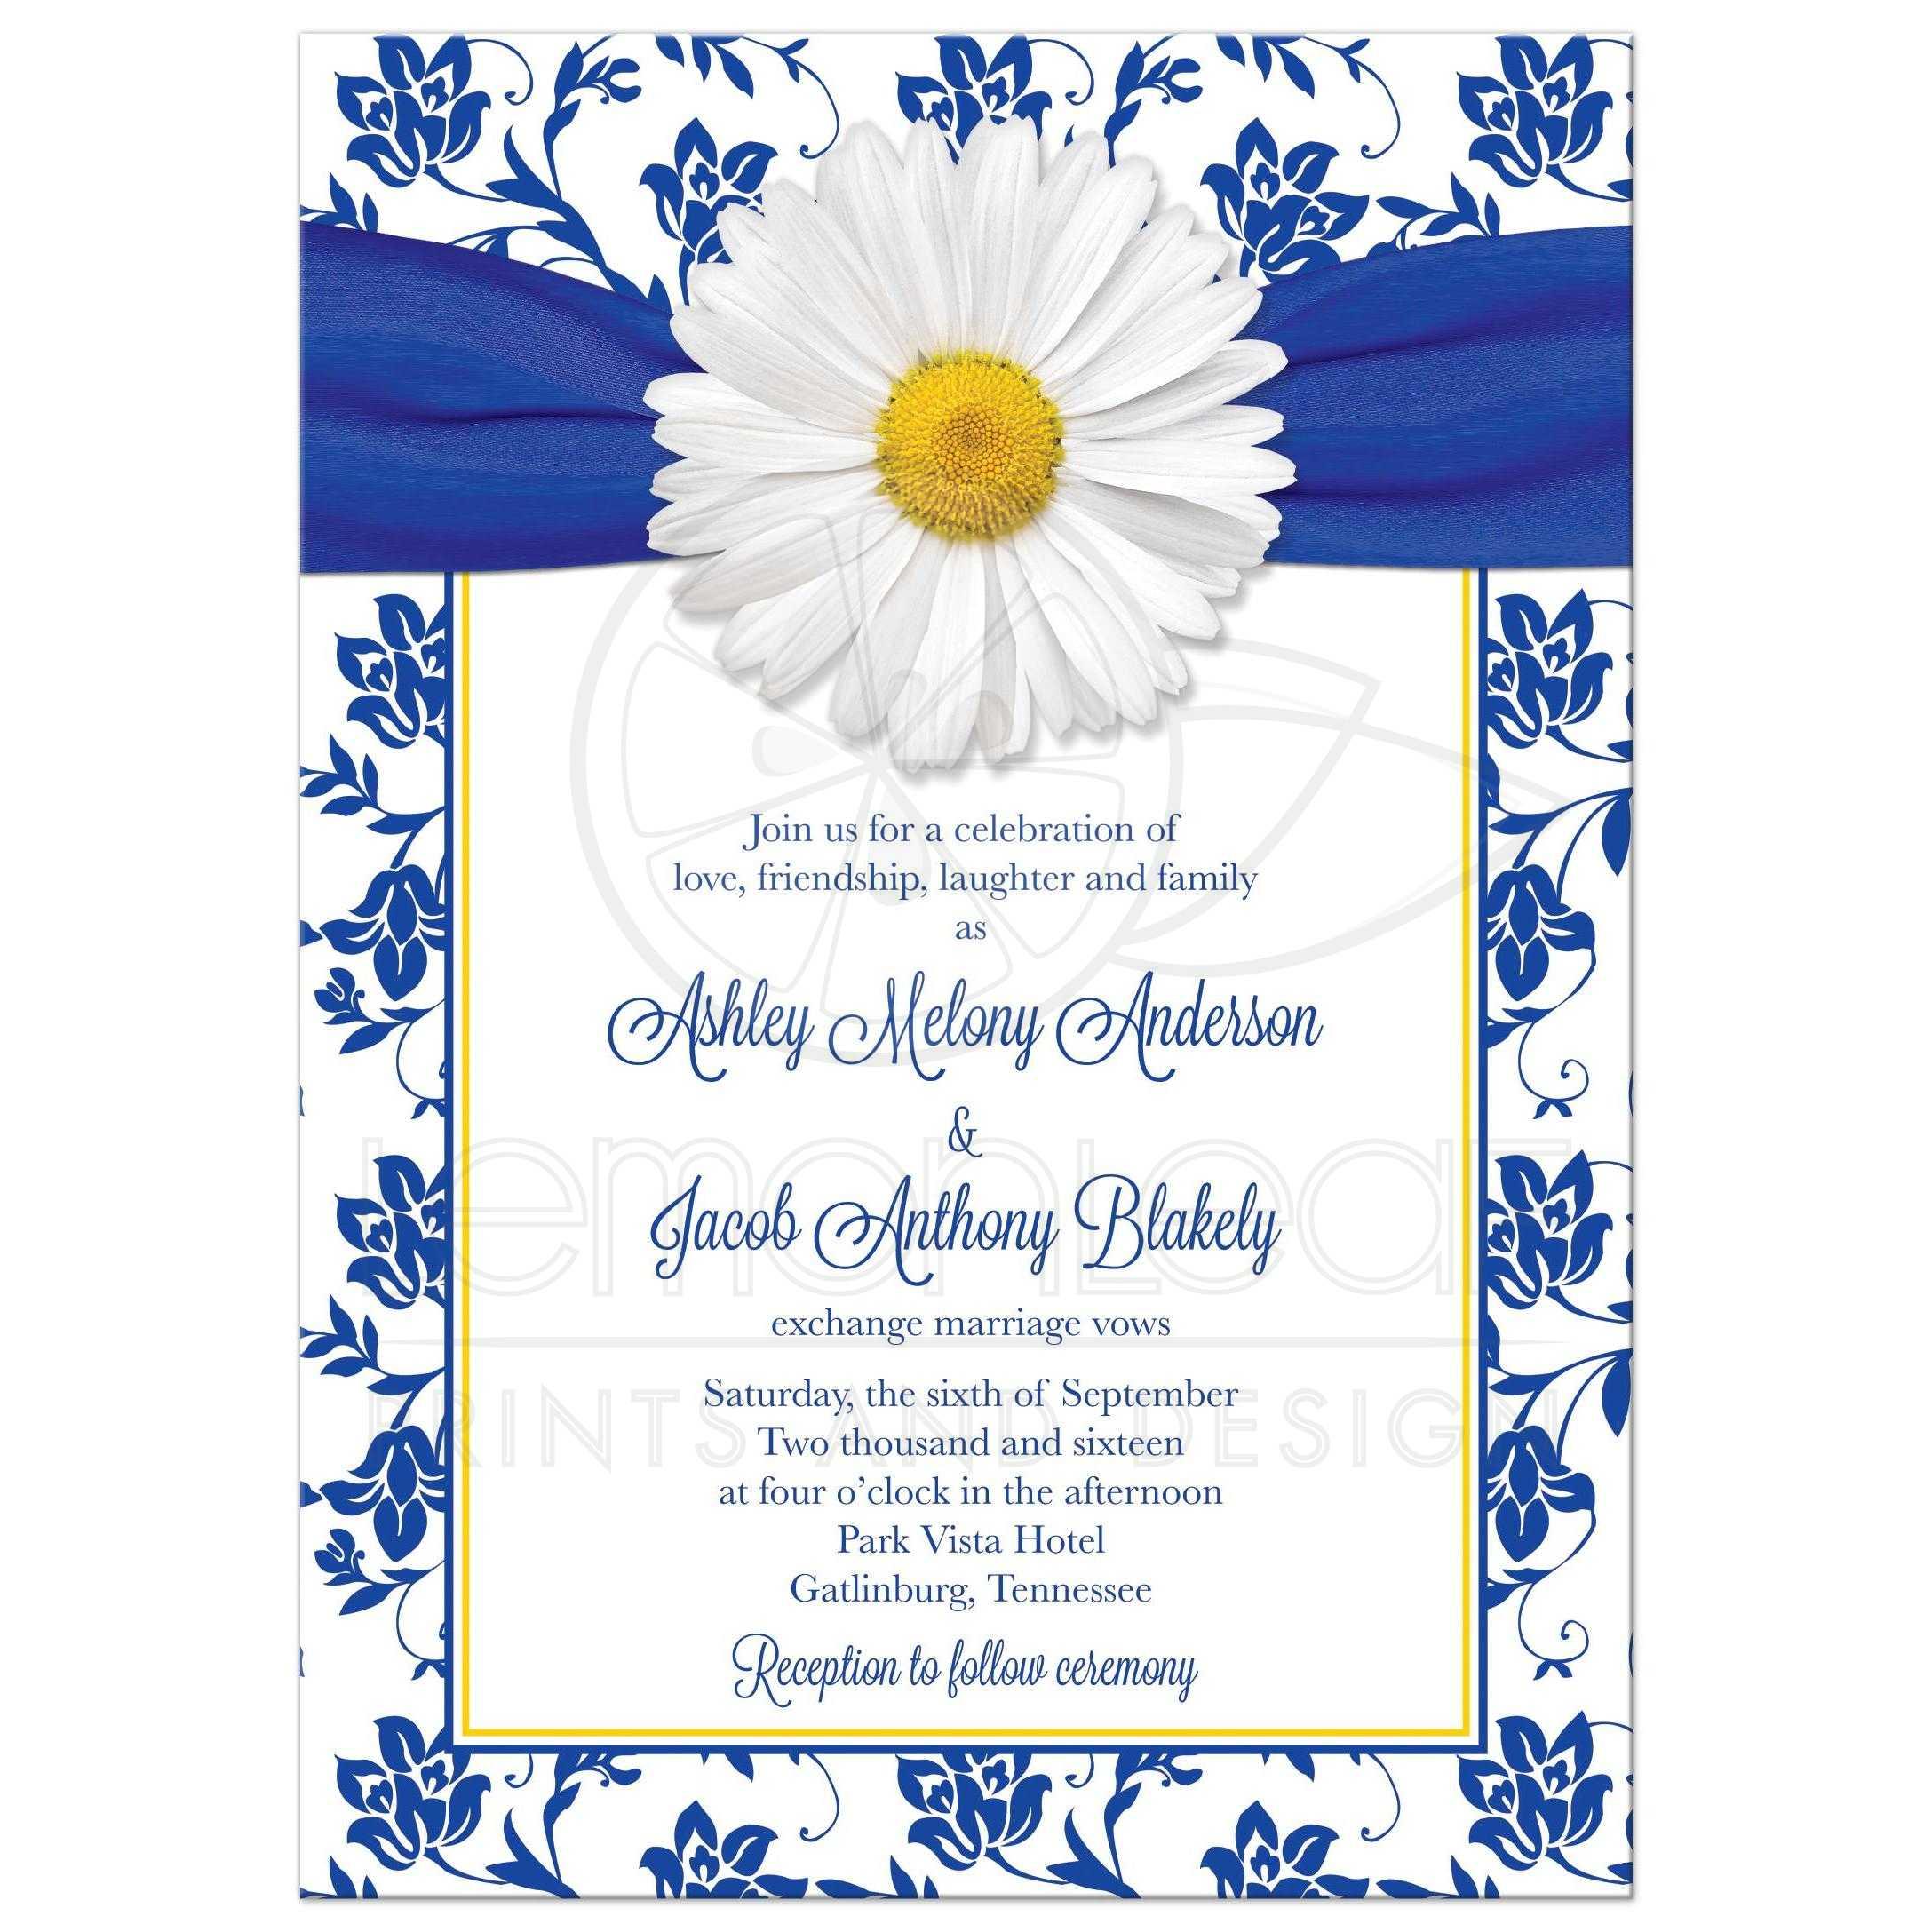 White Shasta Daisy And Royal Blue Floral Damask And Ribbon Wedding  Invitation Front ...